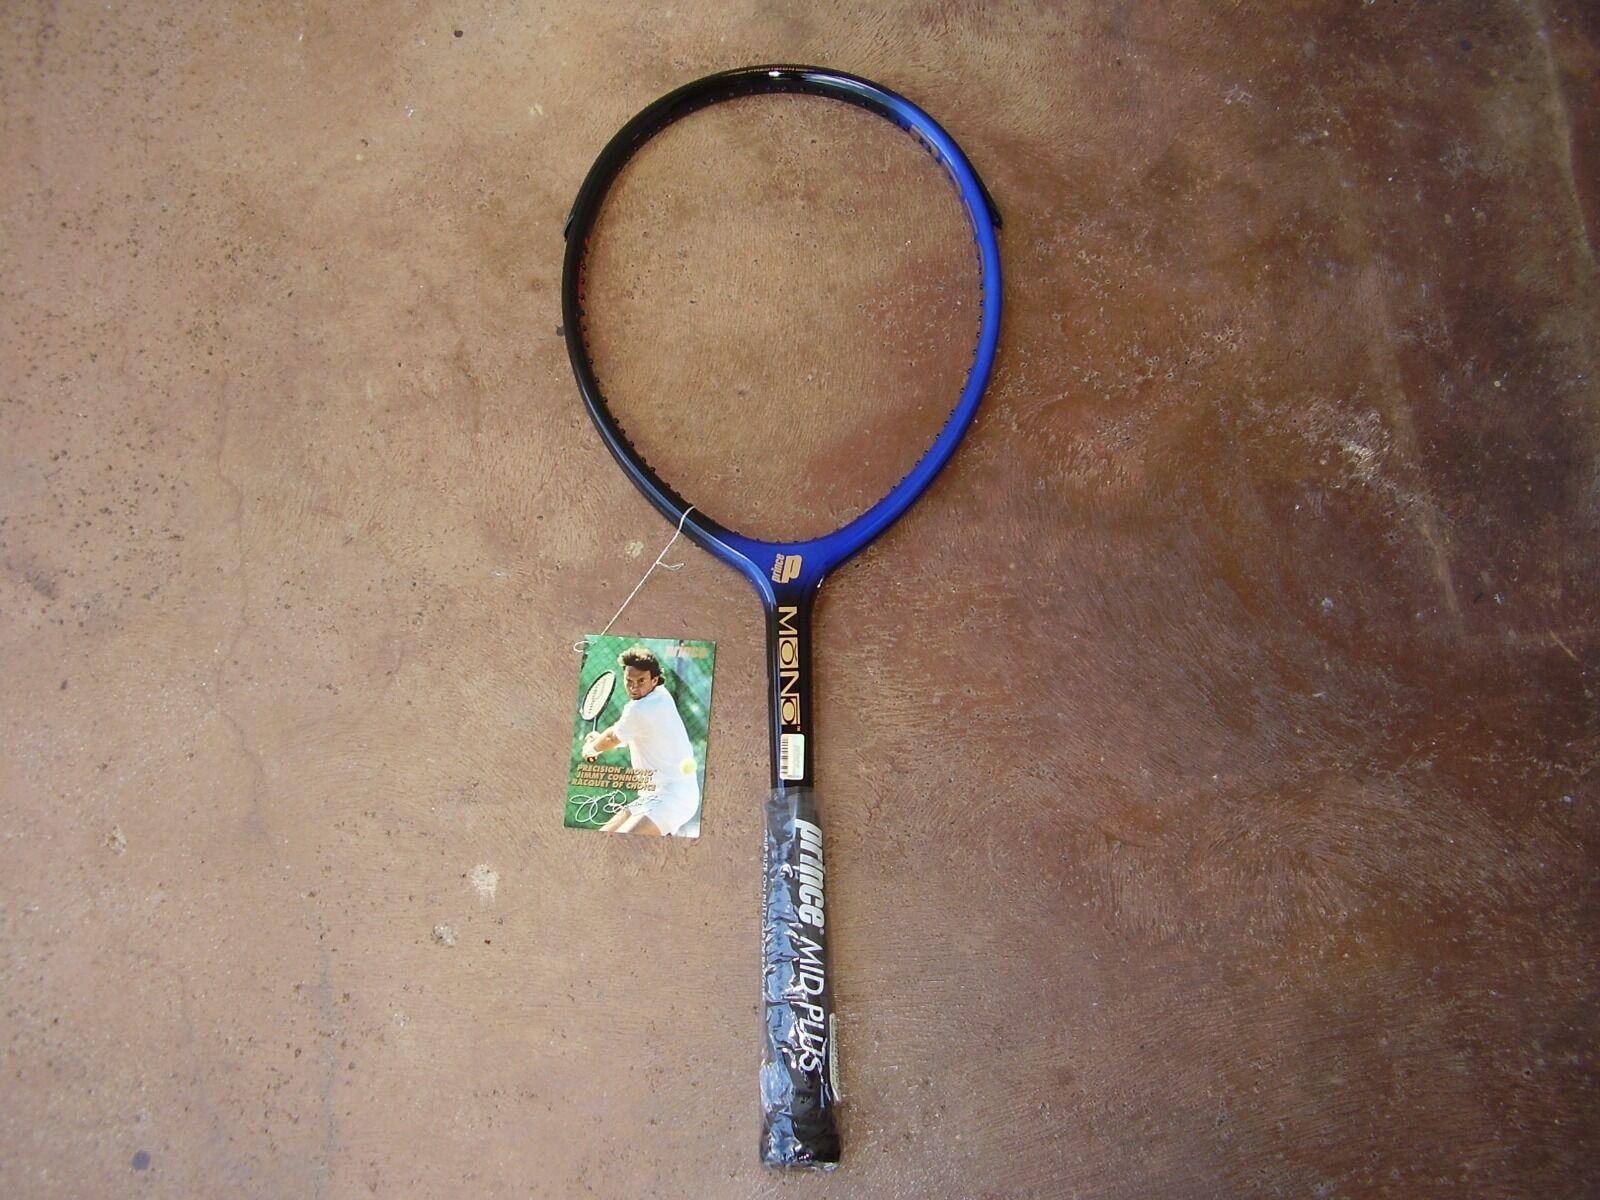 Nuevo Raro Príncipe Mono 650 Conners Tenis Raqueta 41 4 bowout